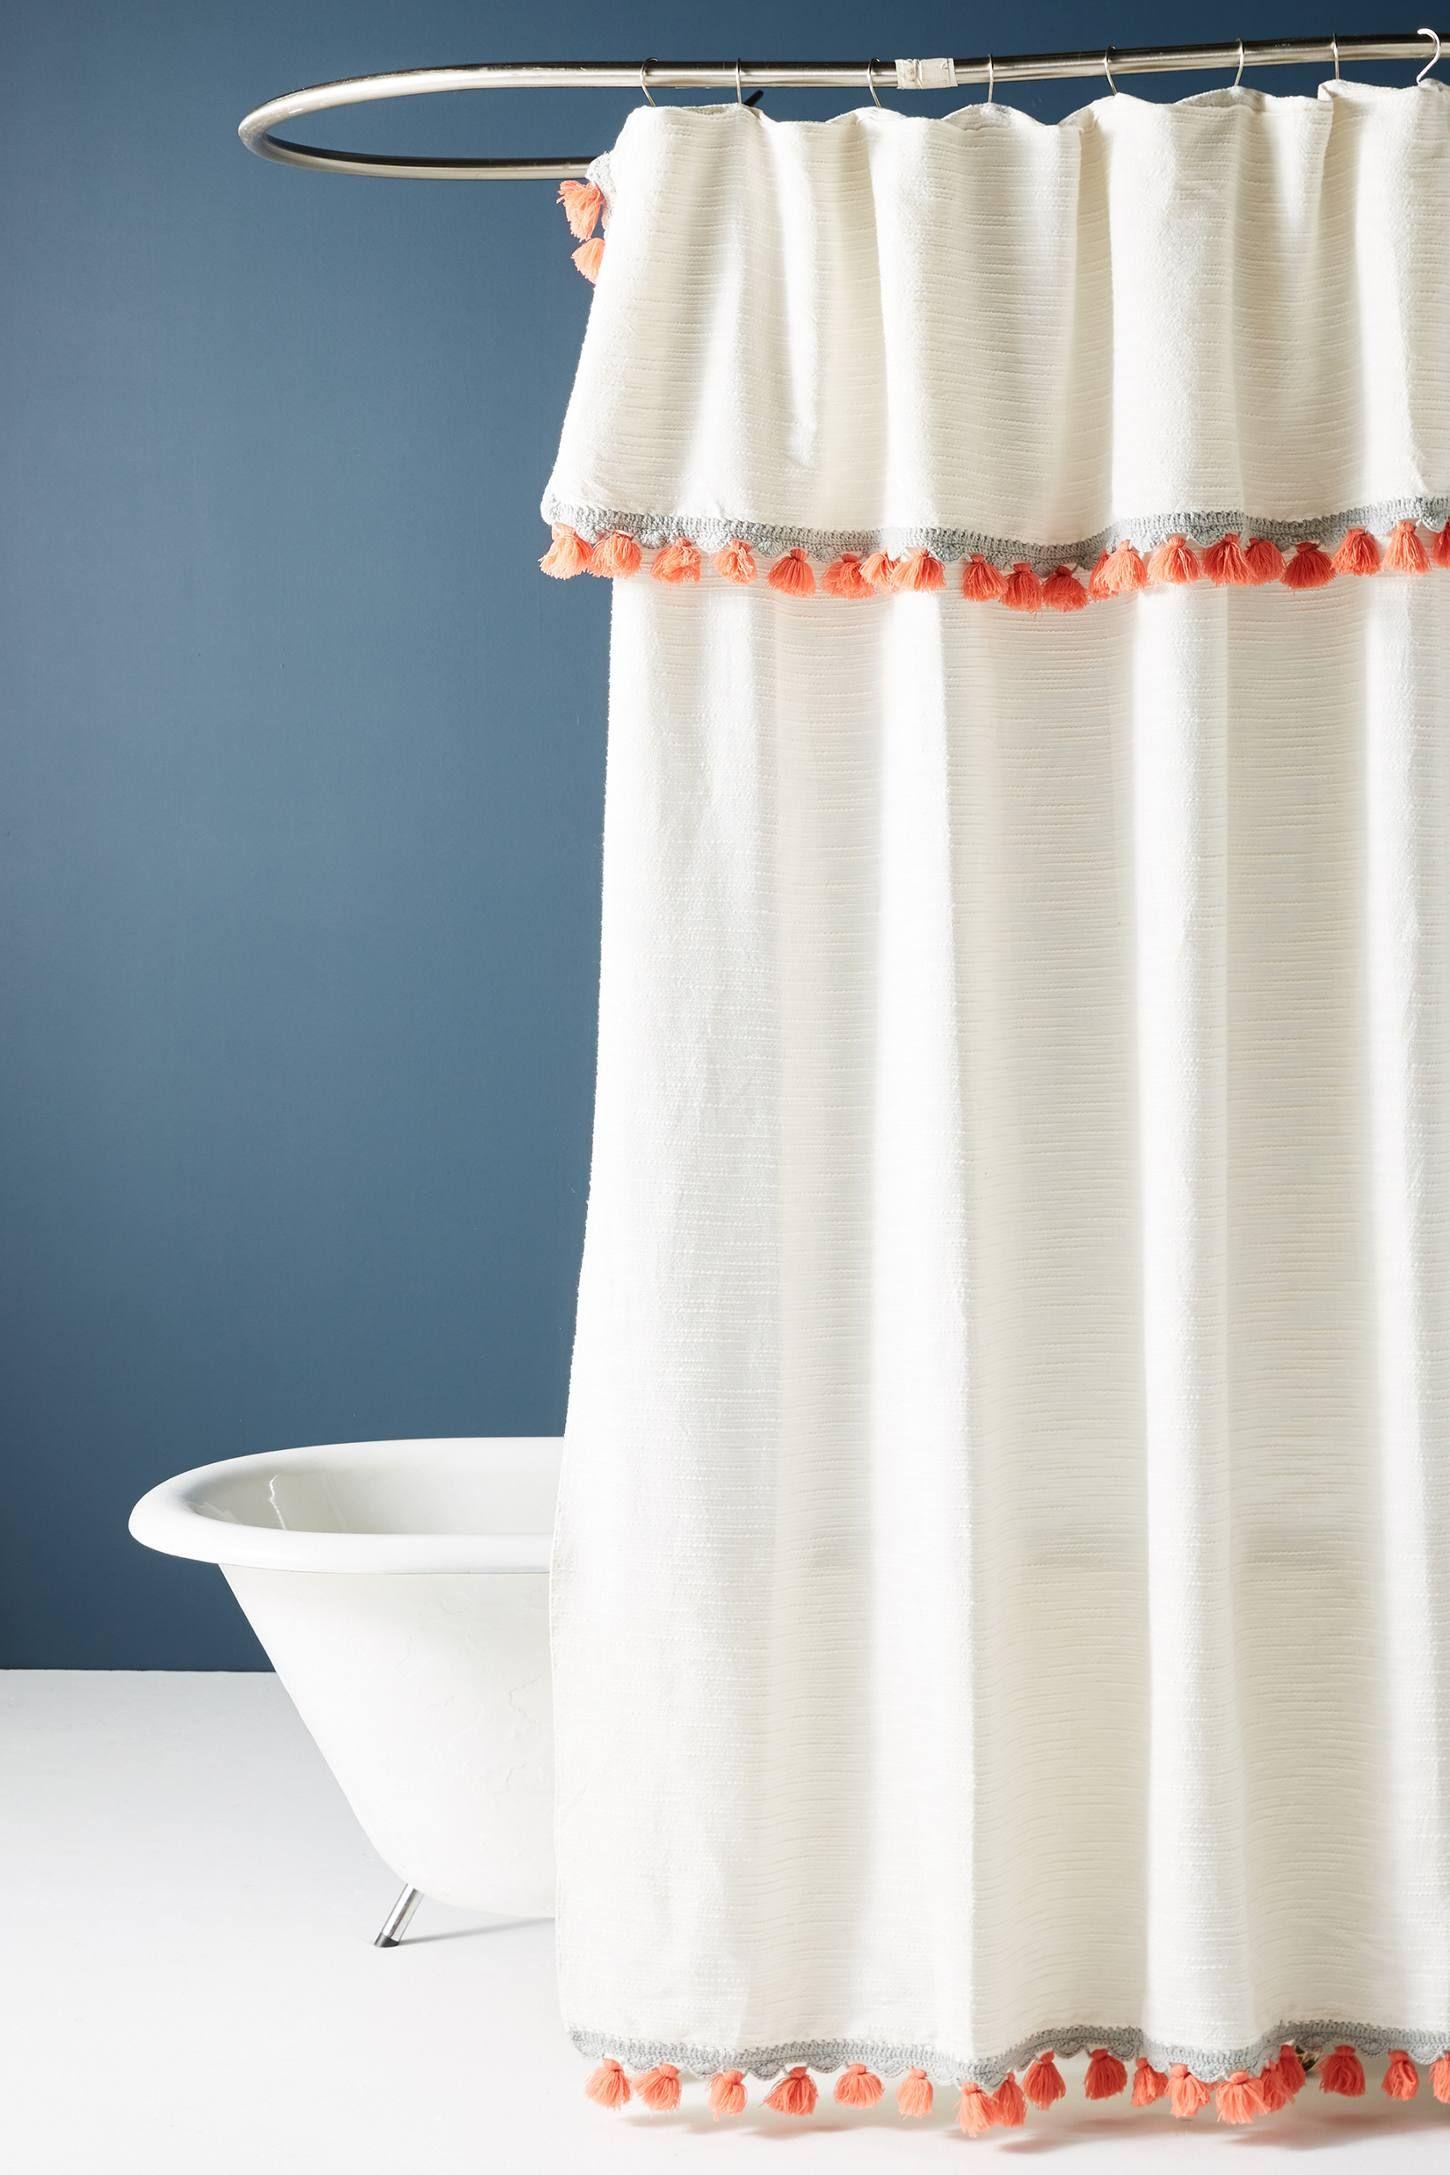 Tasseled Arden Shower Curtain Boho Shower Curtain Boho Shower